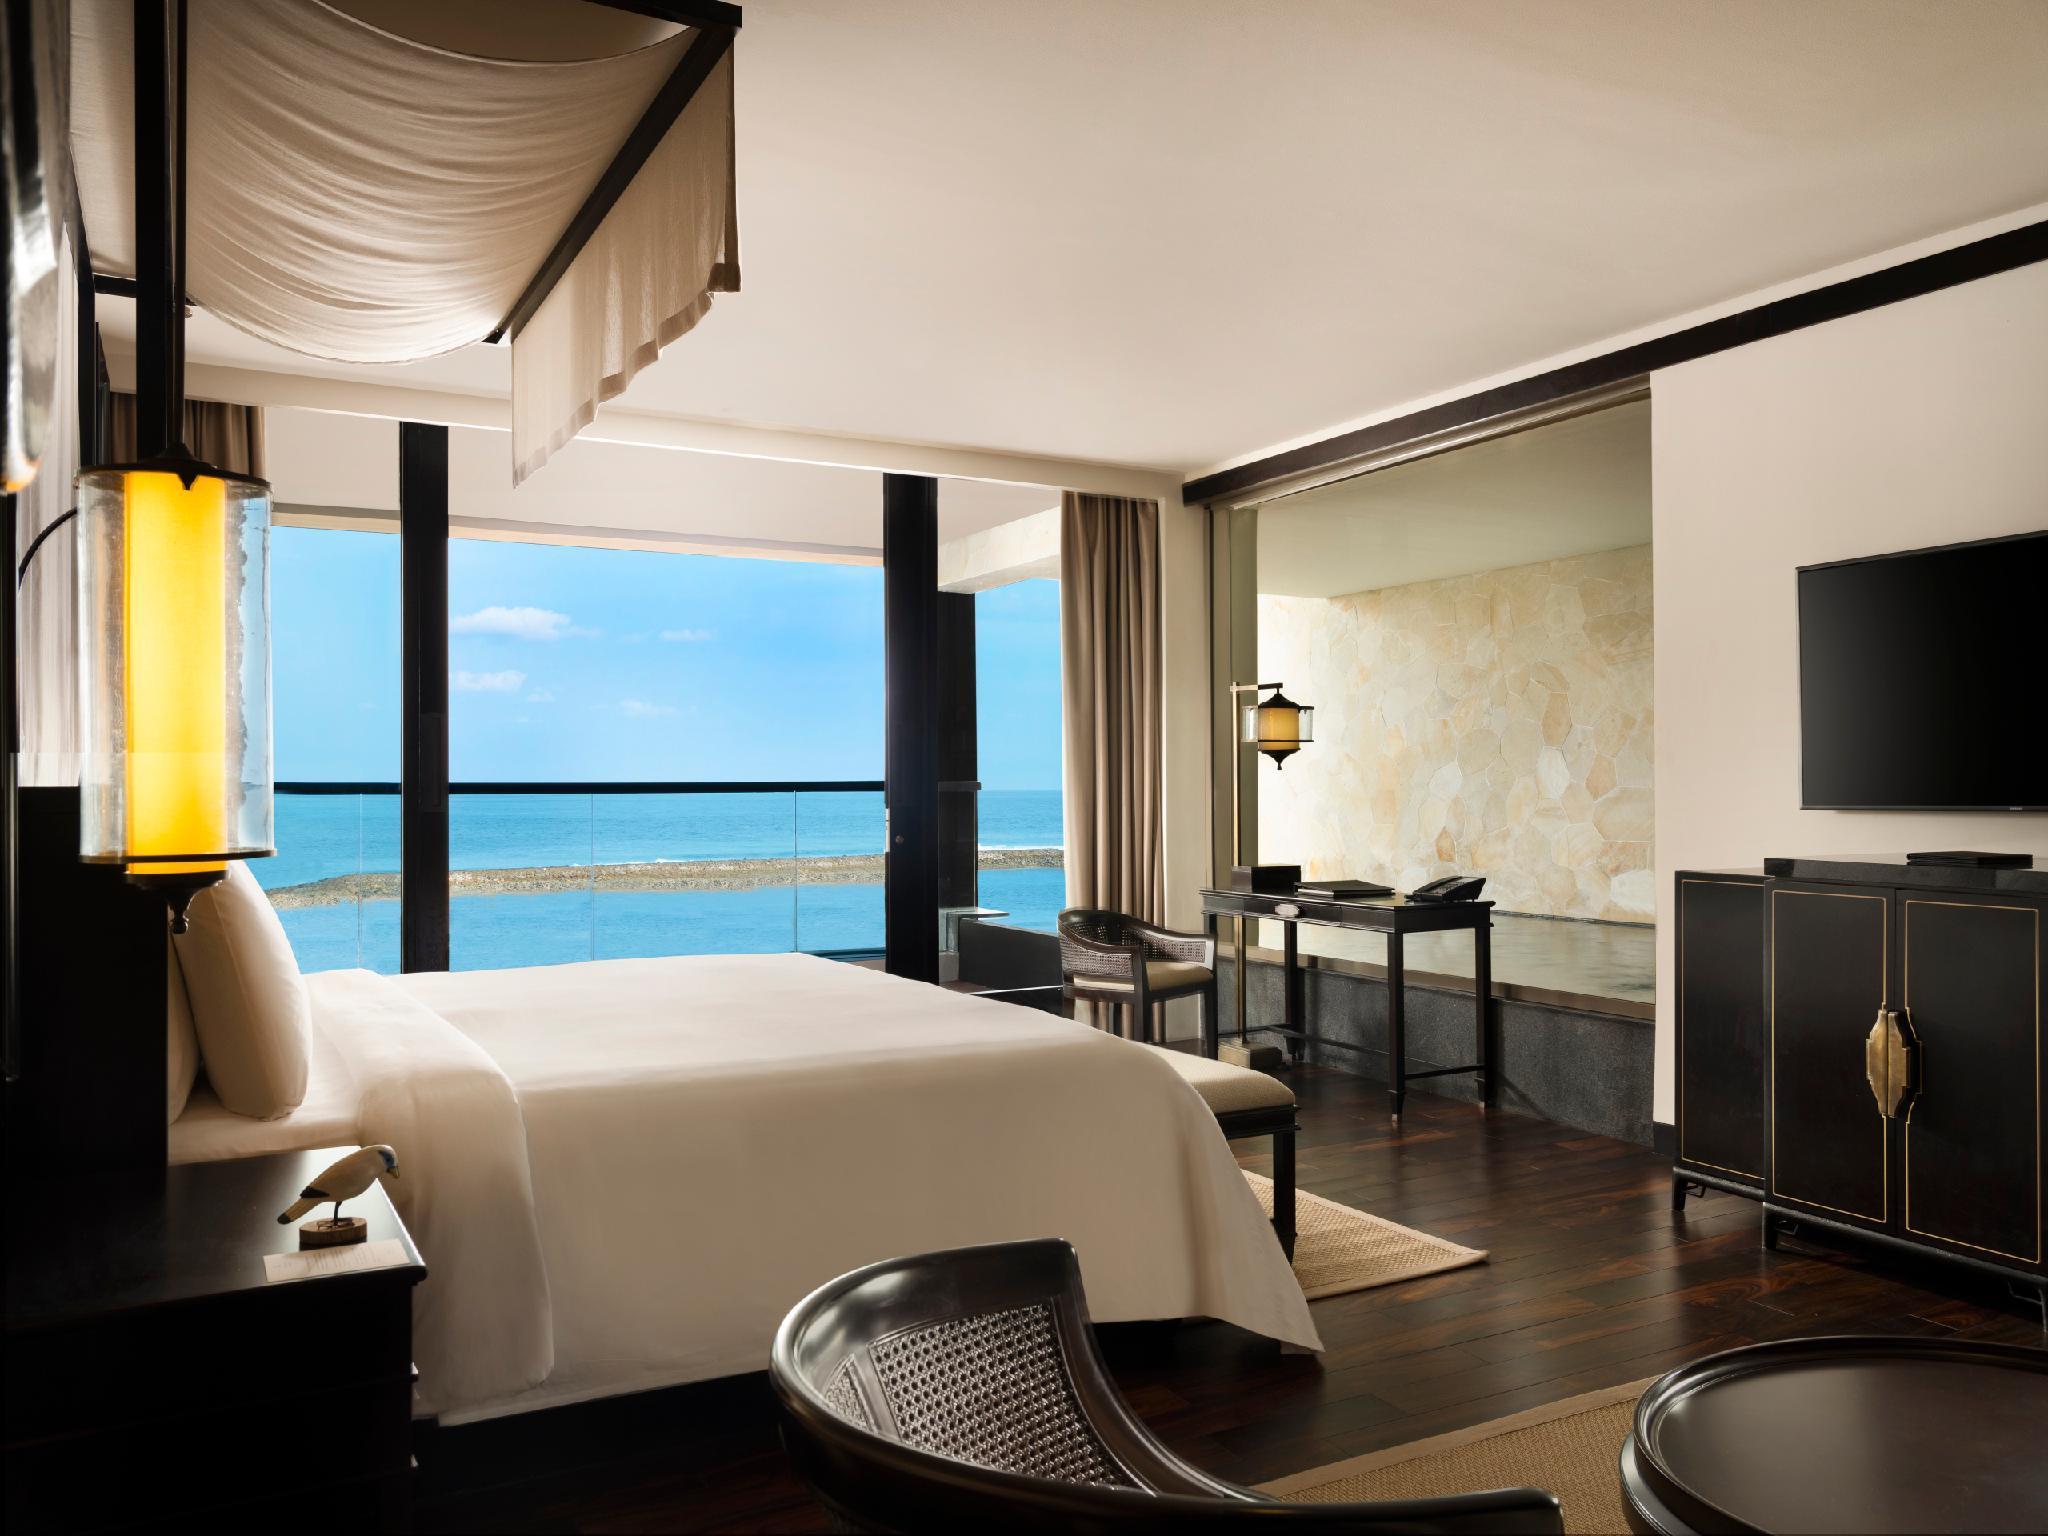 The Apurva Kempinski Bali Bali Offers Free Cancellation 2021 Price Lists Reviews